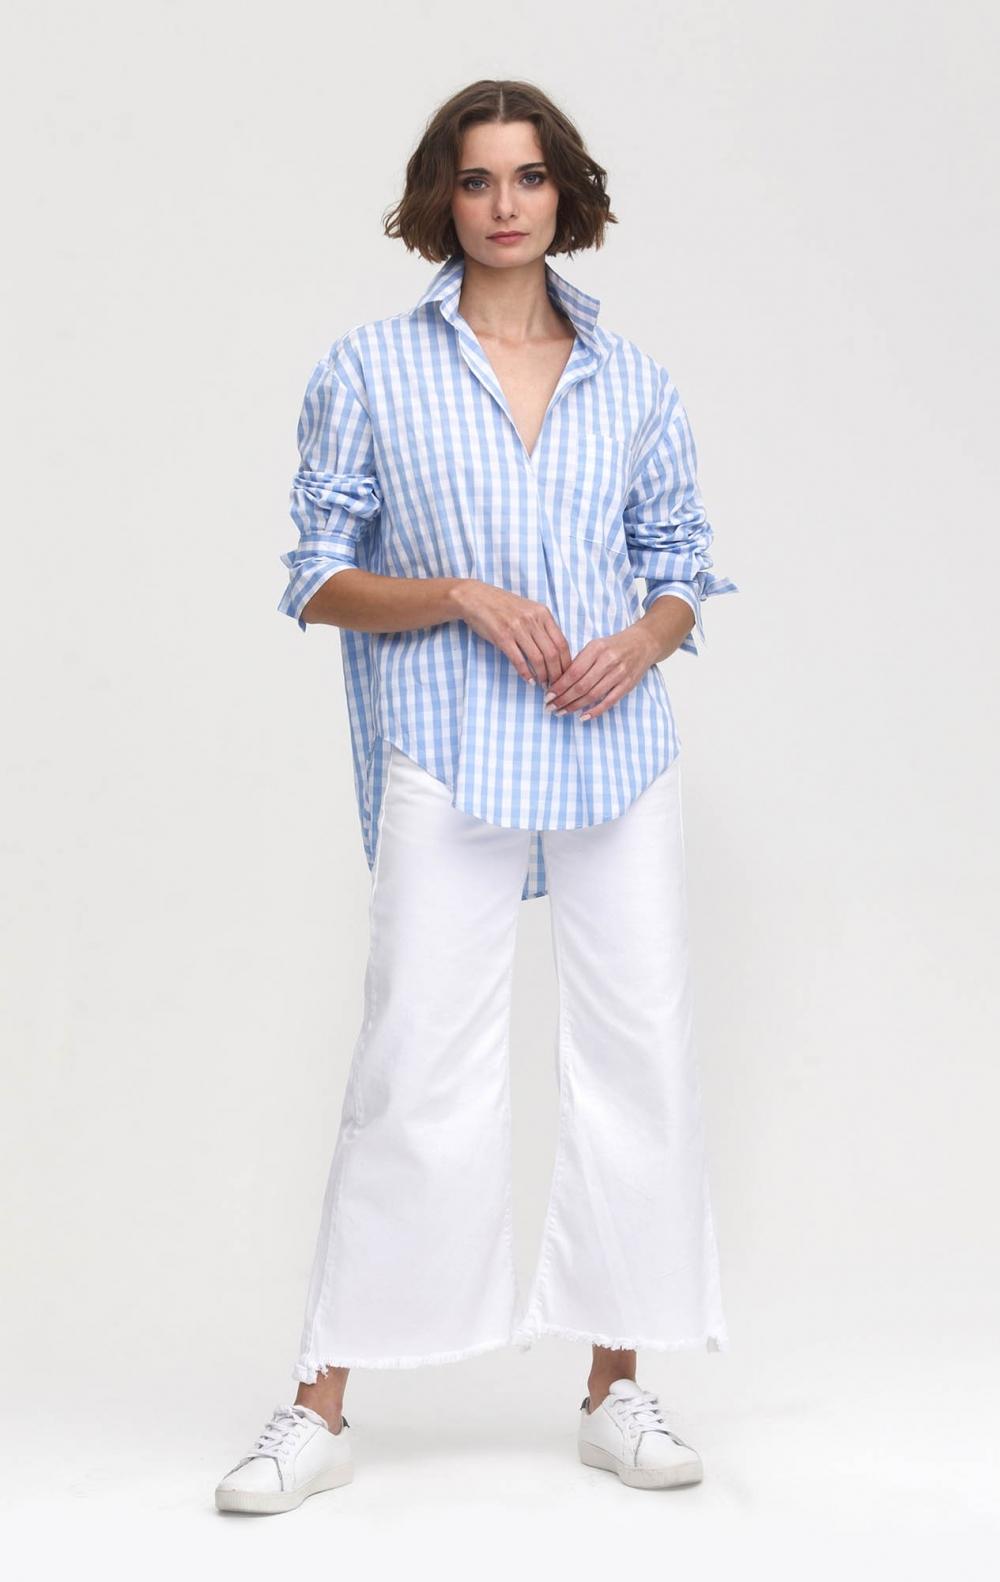 Camisa CB Tricoline Xadrez Azul Claro  - Foto 1